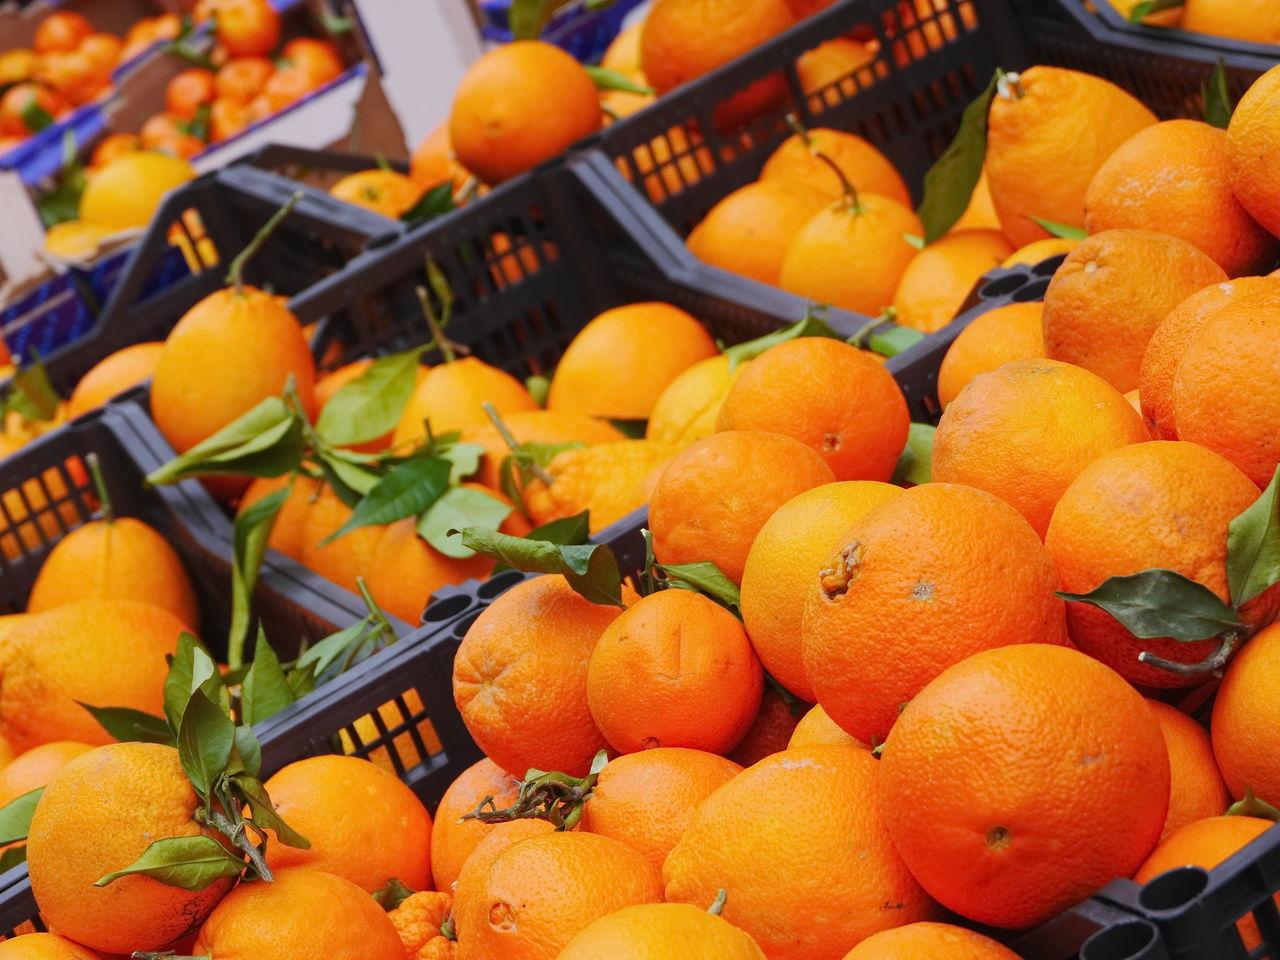 Abundance Close-up Day Farmer's Market Food Food And Drink Freshness Fruit Healthy Eating Healthy Lifestyle Leaf Market Market Stall No People Orange - Fruit Orange Color Outdoors Pumpkin Retail